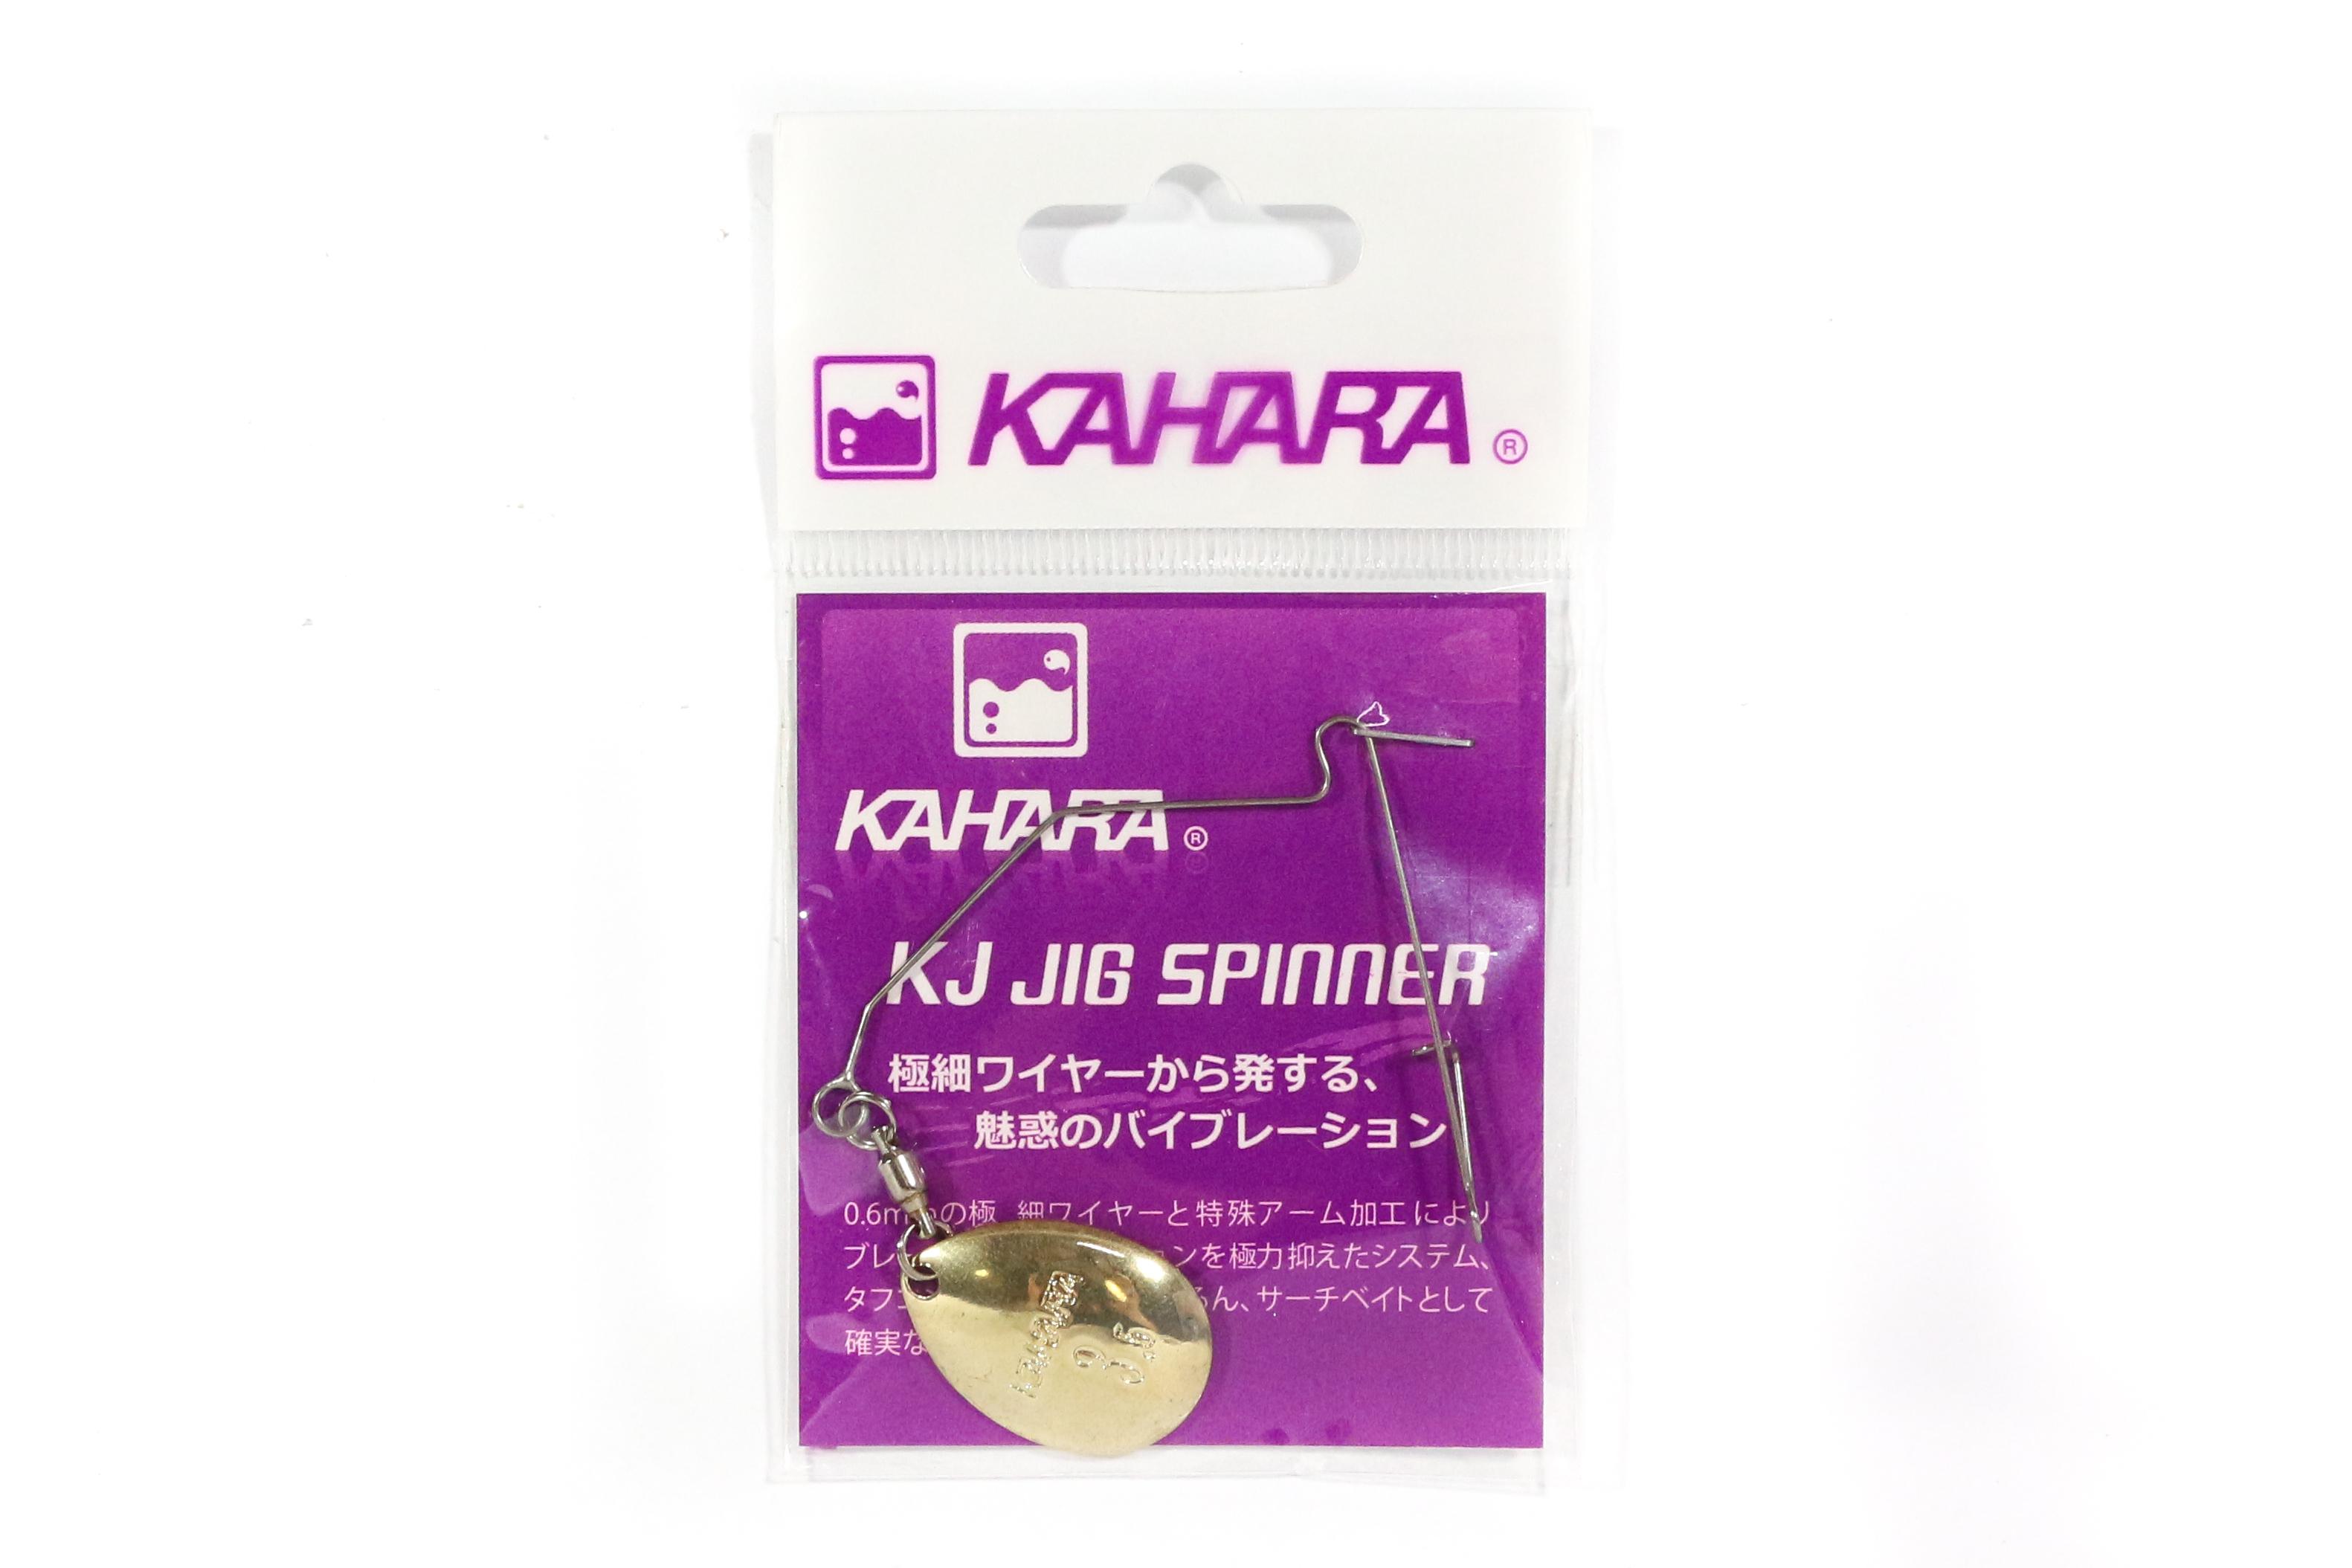 Kahara KJ Jig Spinner Wire Colarado Blade Gold Size 3.5 (1871)